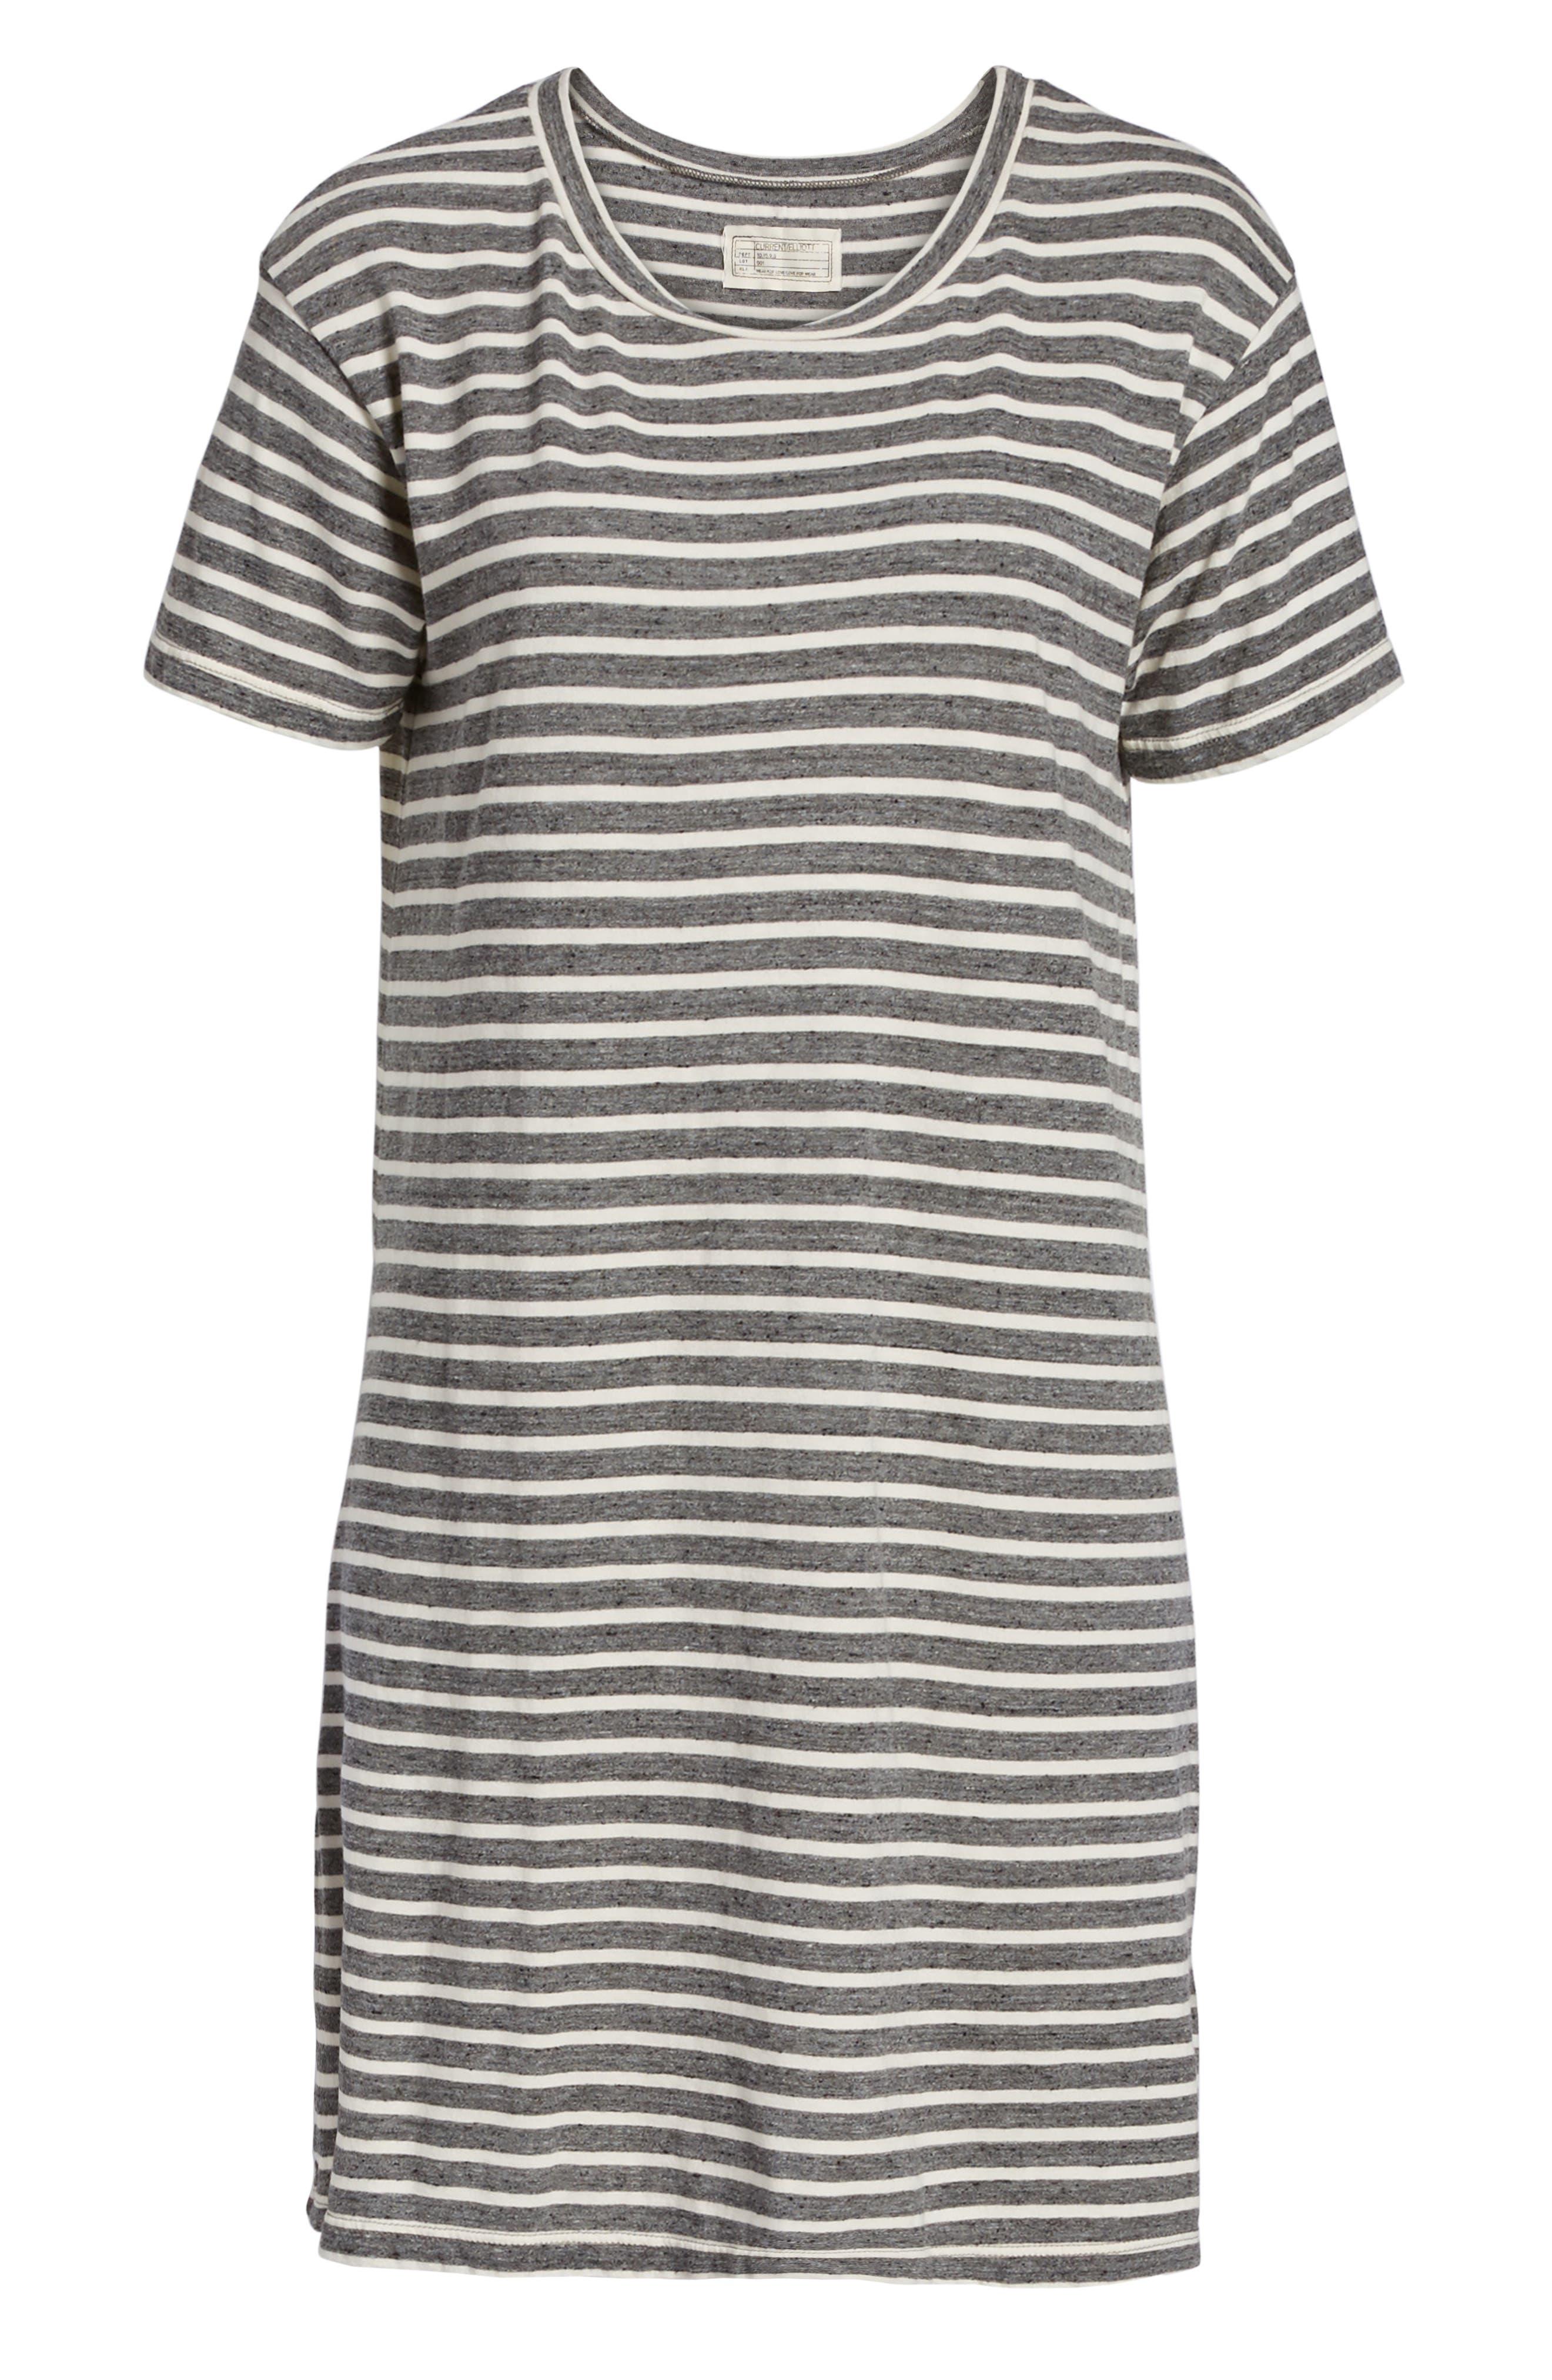 Stripe Knit T-Shirt Dress,                             Alternate thumbnail 6, color,                             Charcoal Anchor Stripe